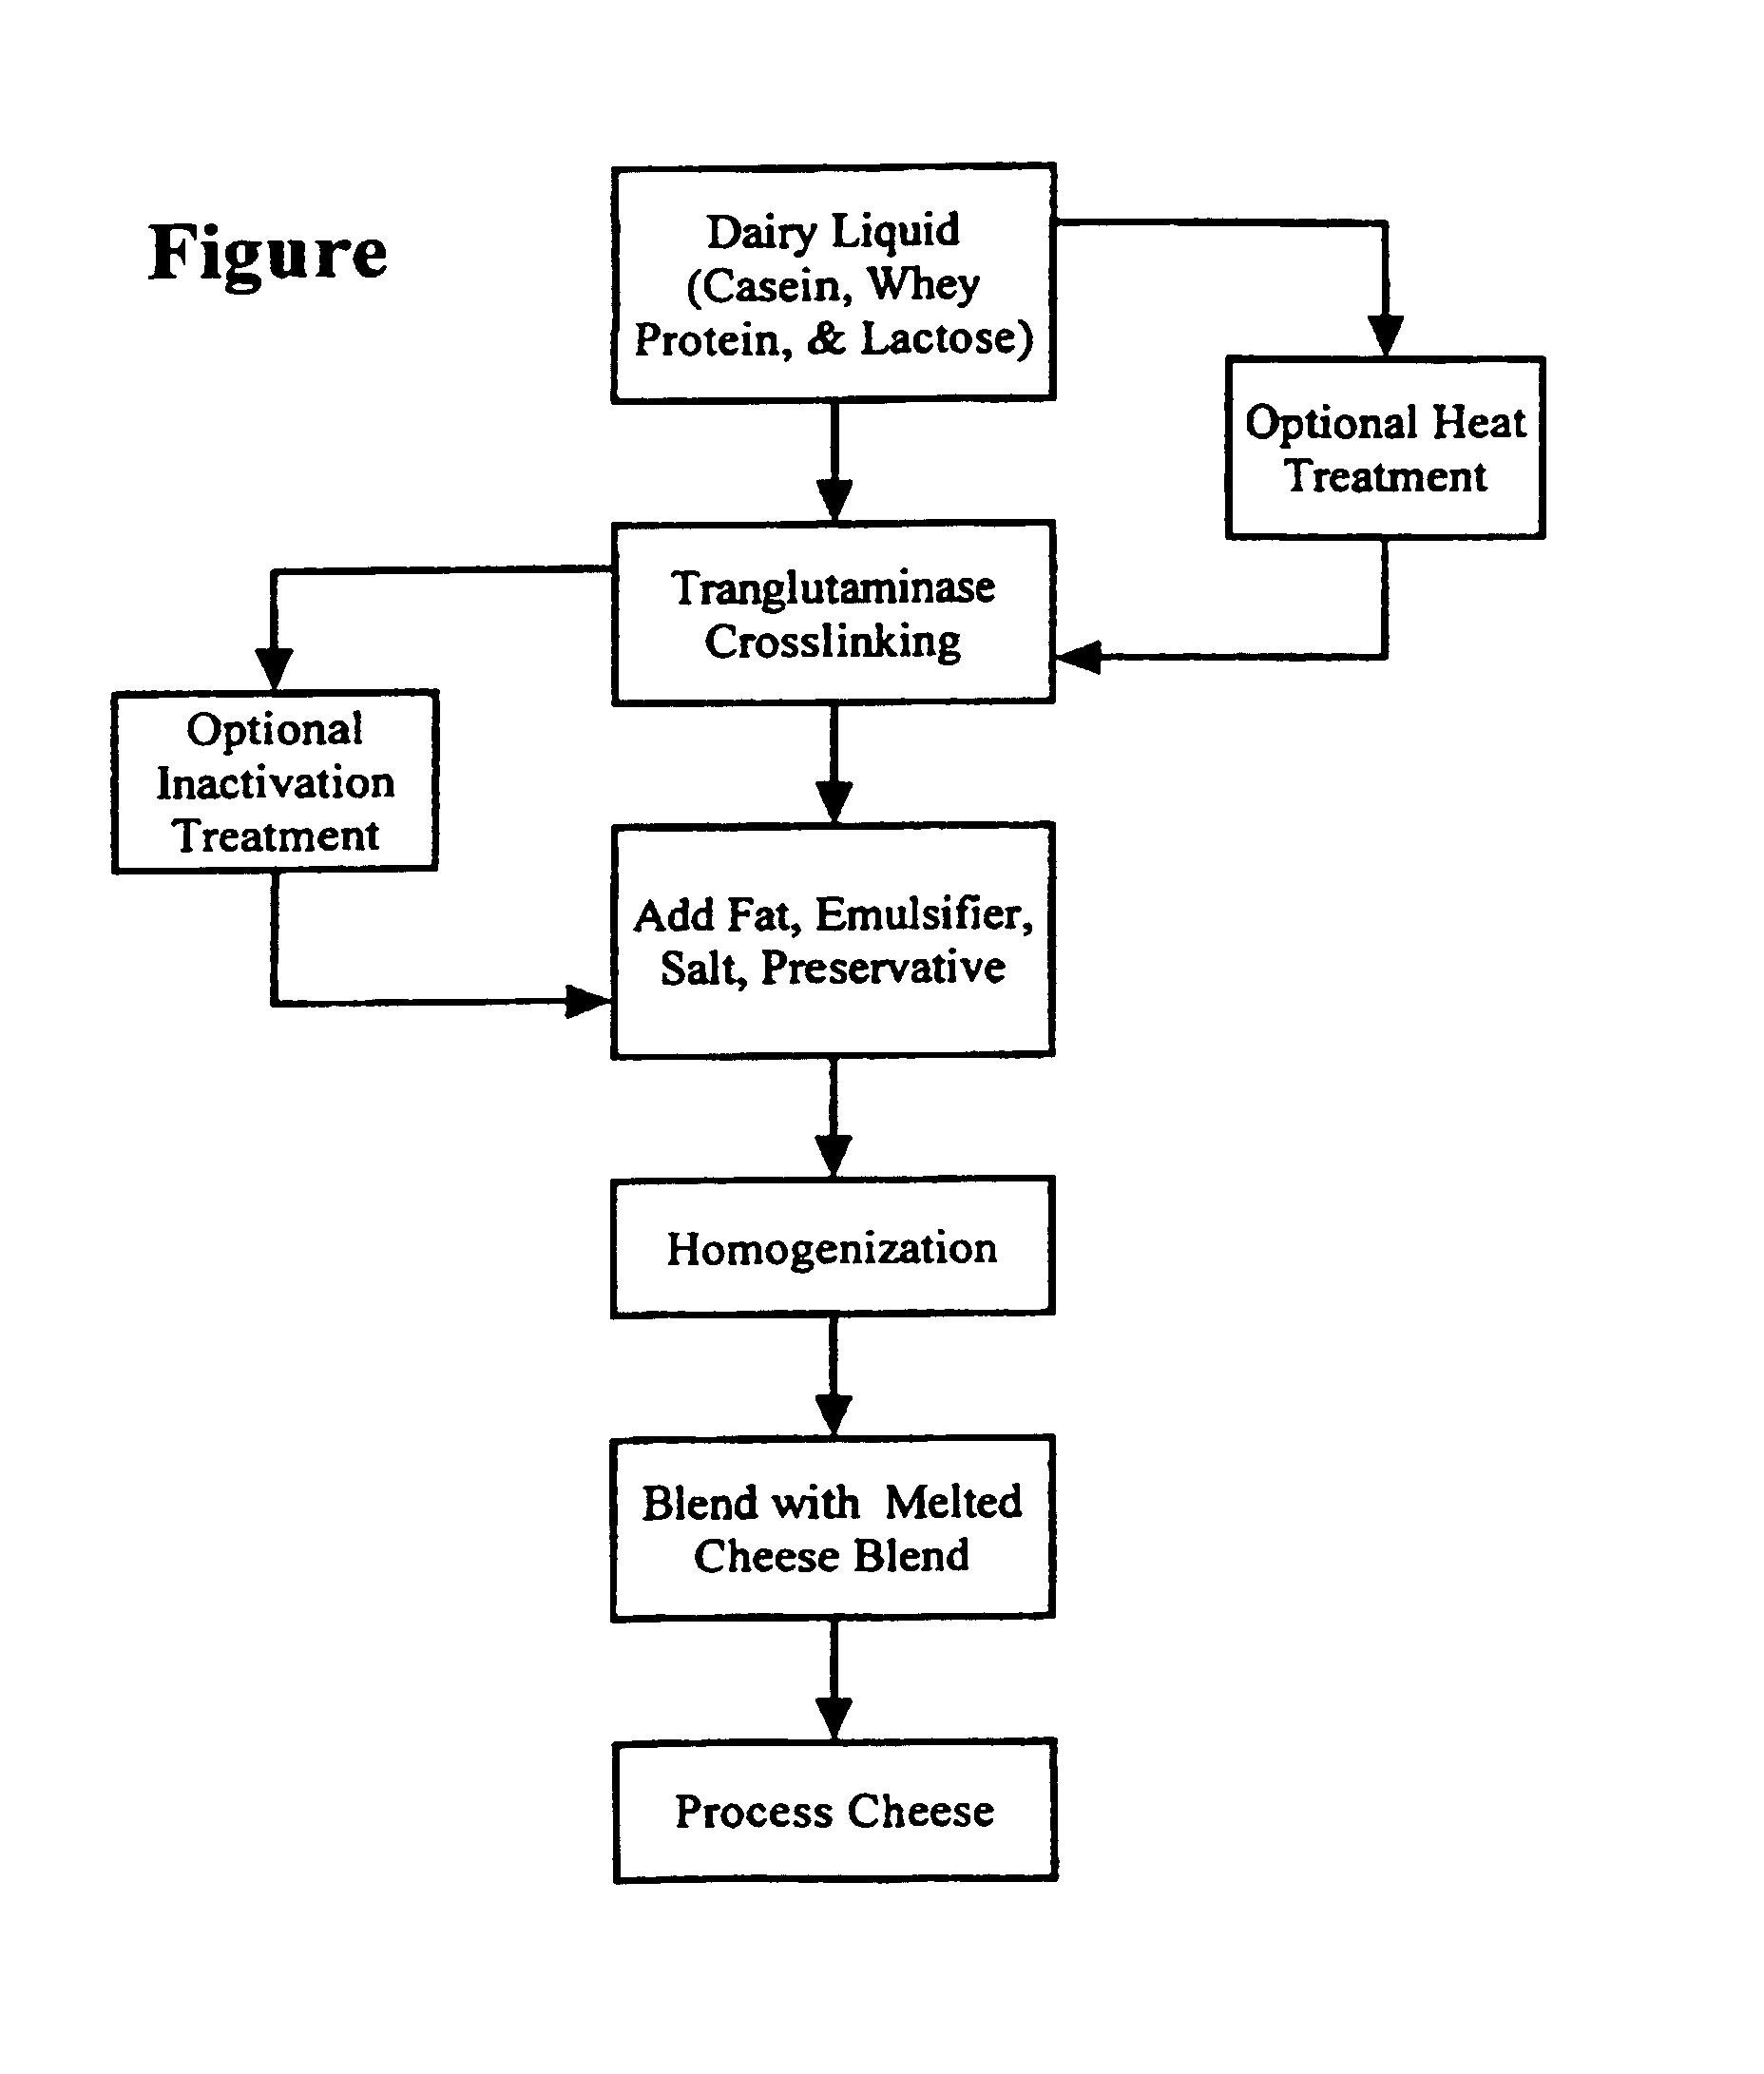 hight resolution of production yogurt flowchart ep1057412b1 into whey patent process of incorporation